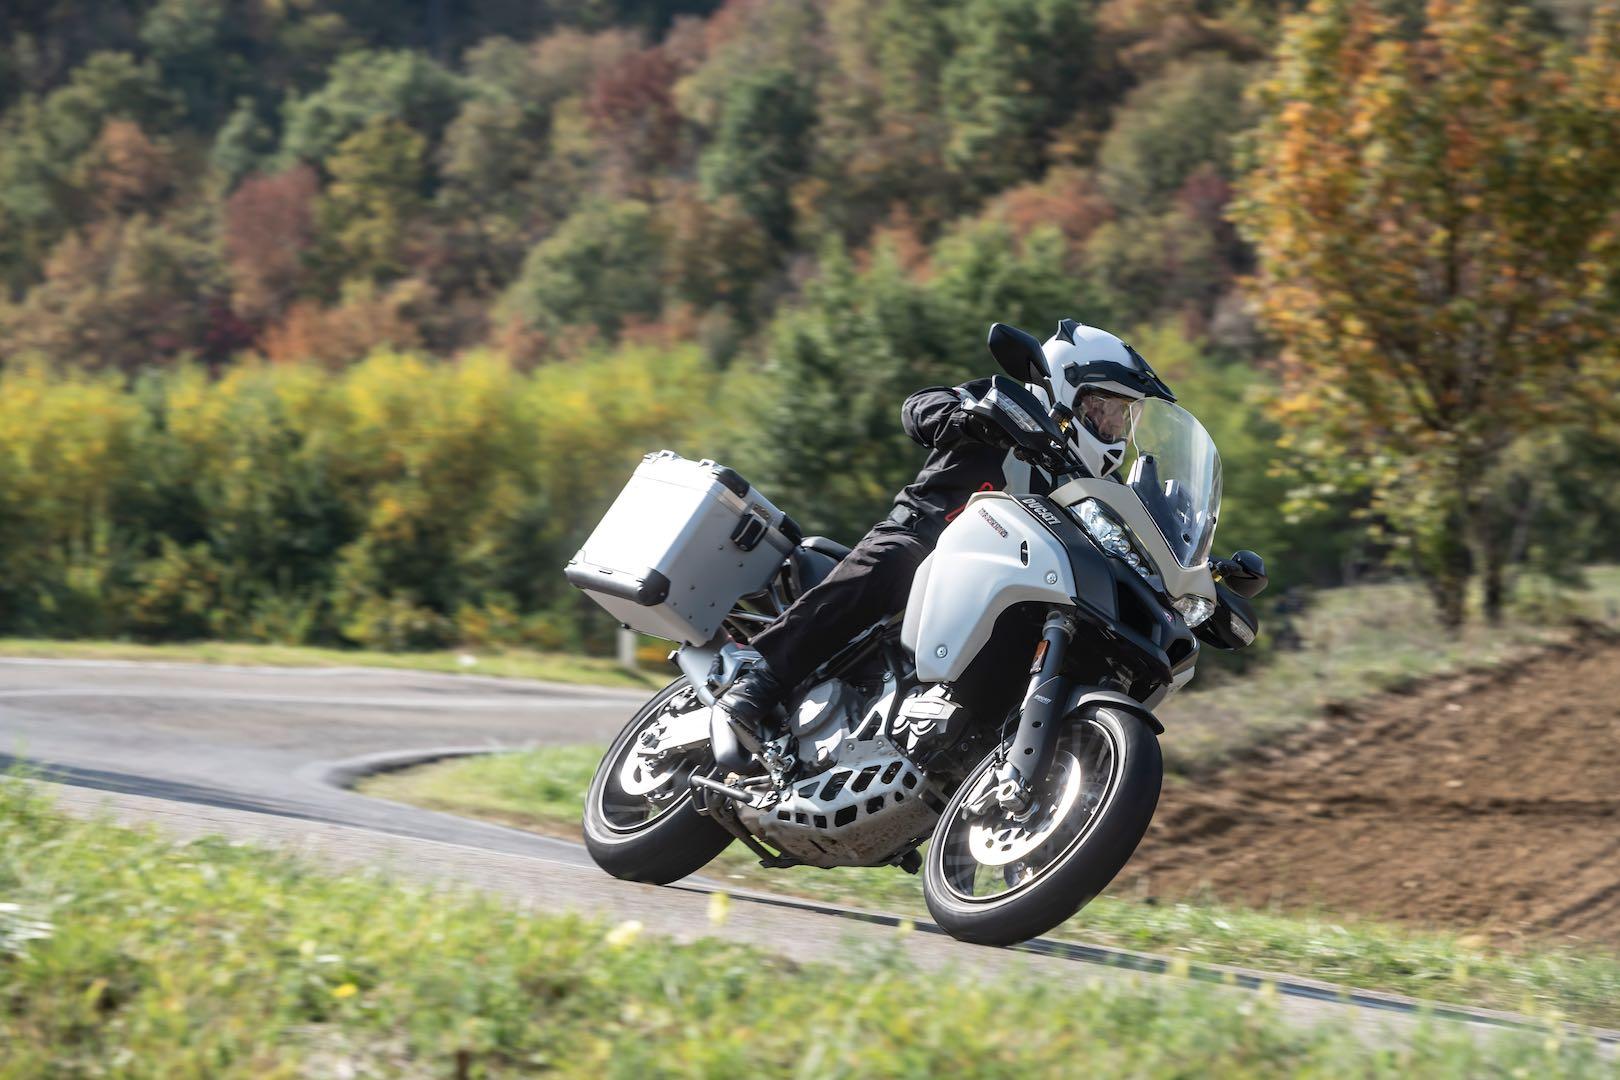 2019 Ducati Multistrada 1260 Enduro Test | Conservative Maniac